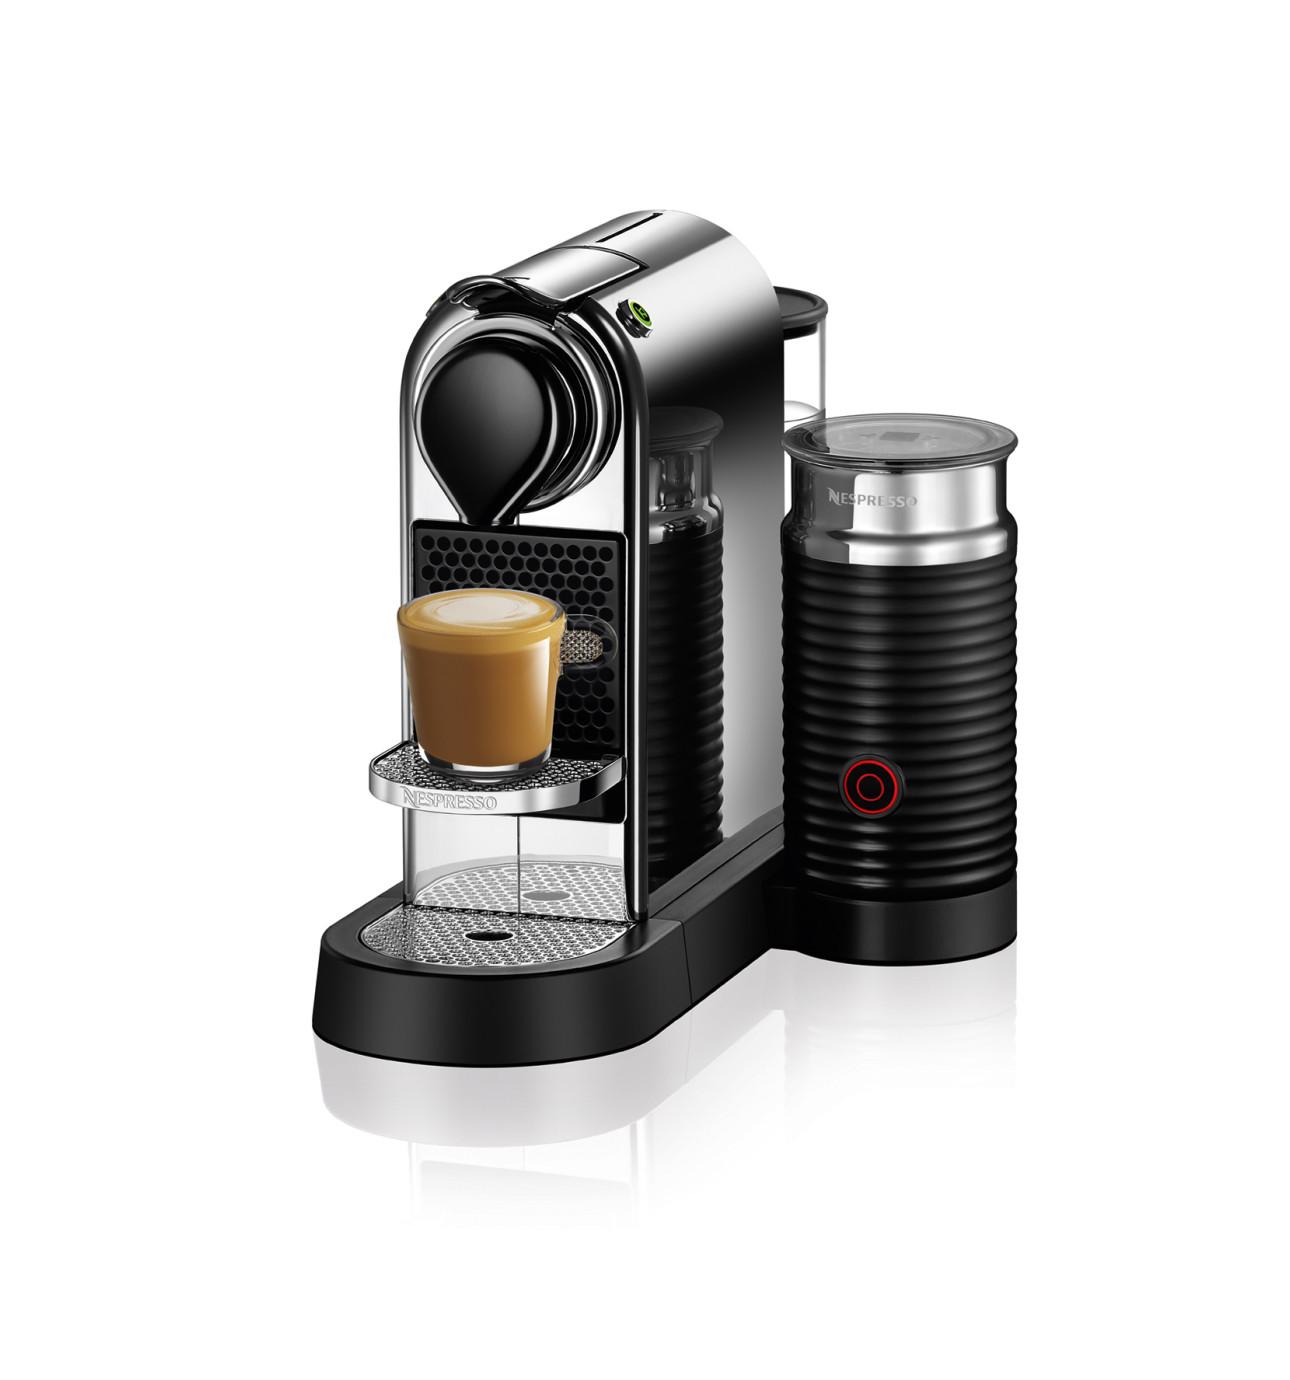 Electronic David Jones Coffee Machines nespresso bec200xw inissia coffee machine bundle white david jones bec650mc citizmilk capsule chrome 399 00